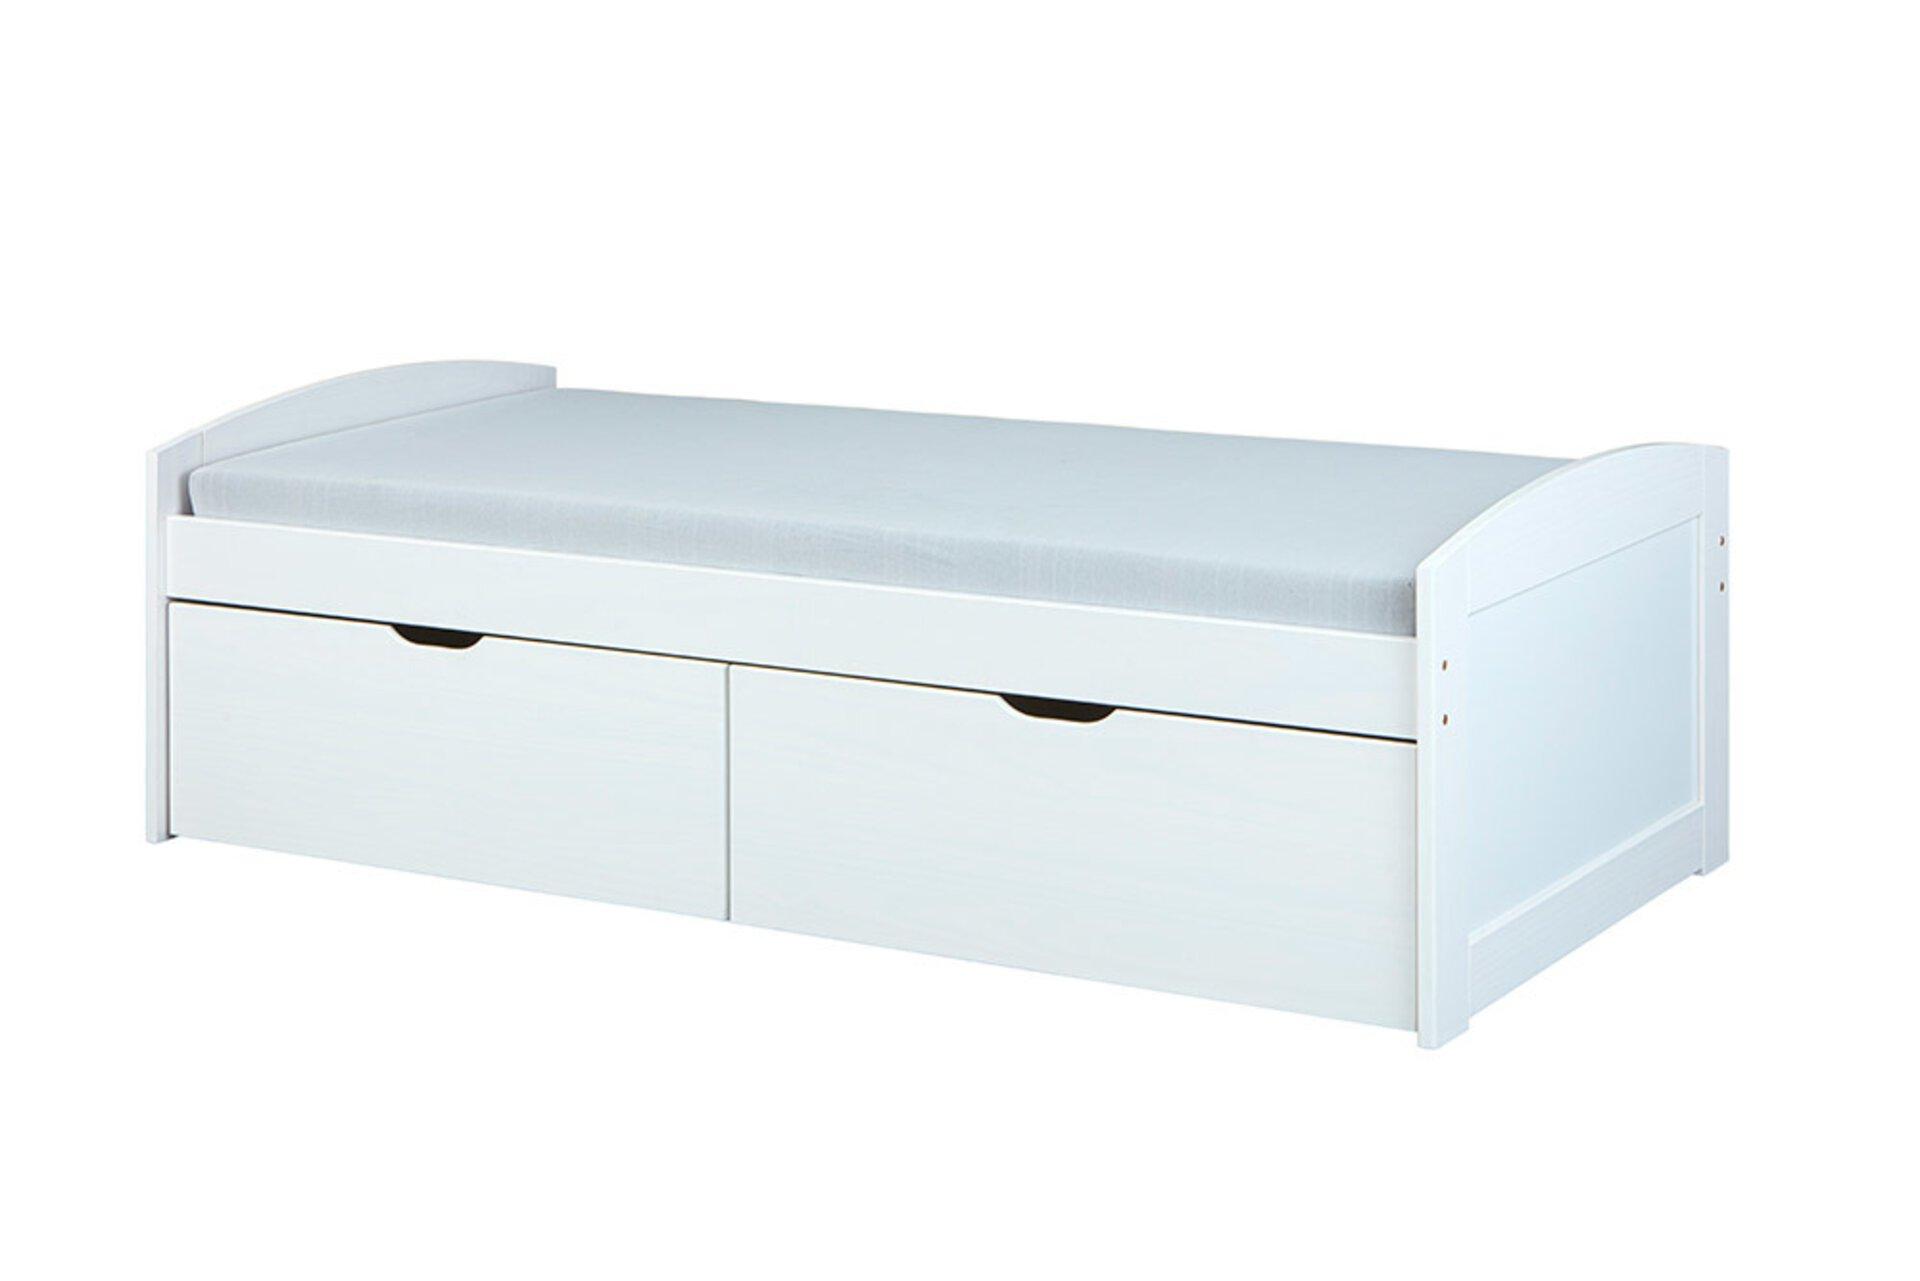 Kinderbett EINAR Dreamoro Holz weiß 205 x 63 x 90 cm